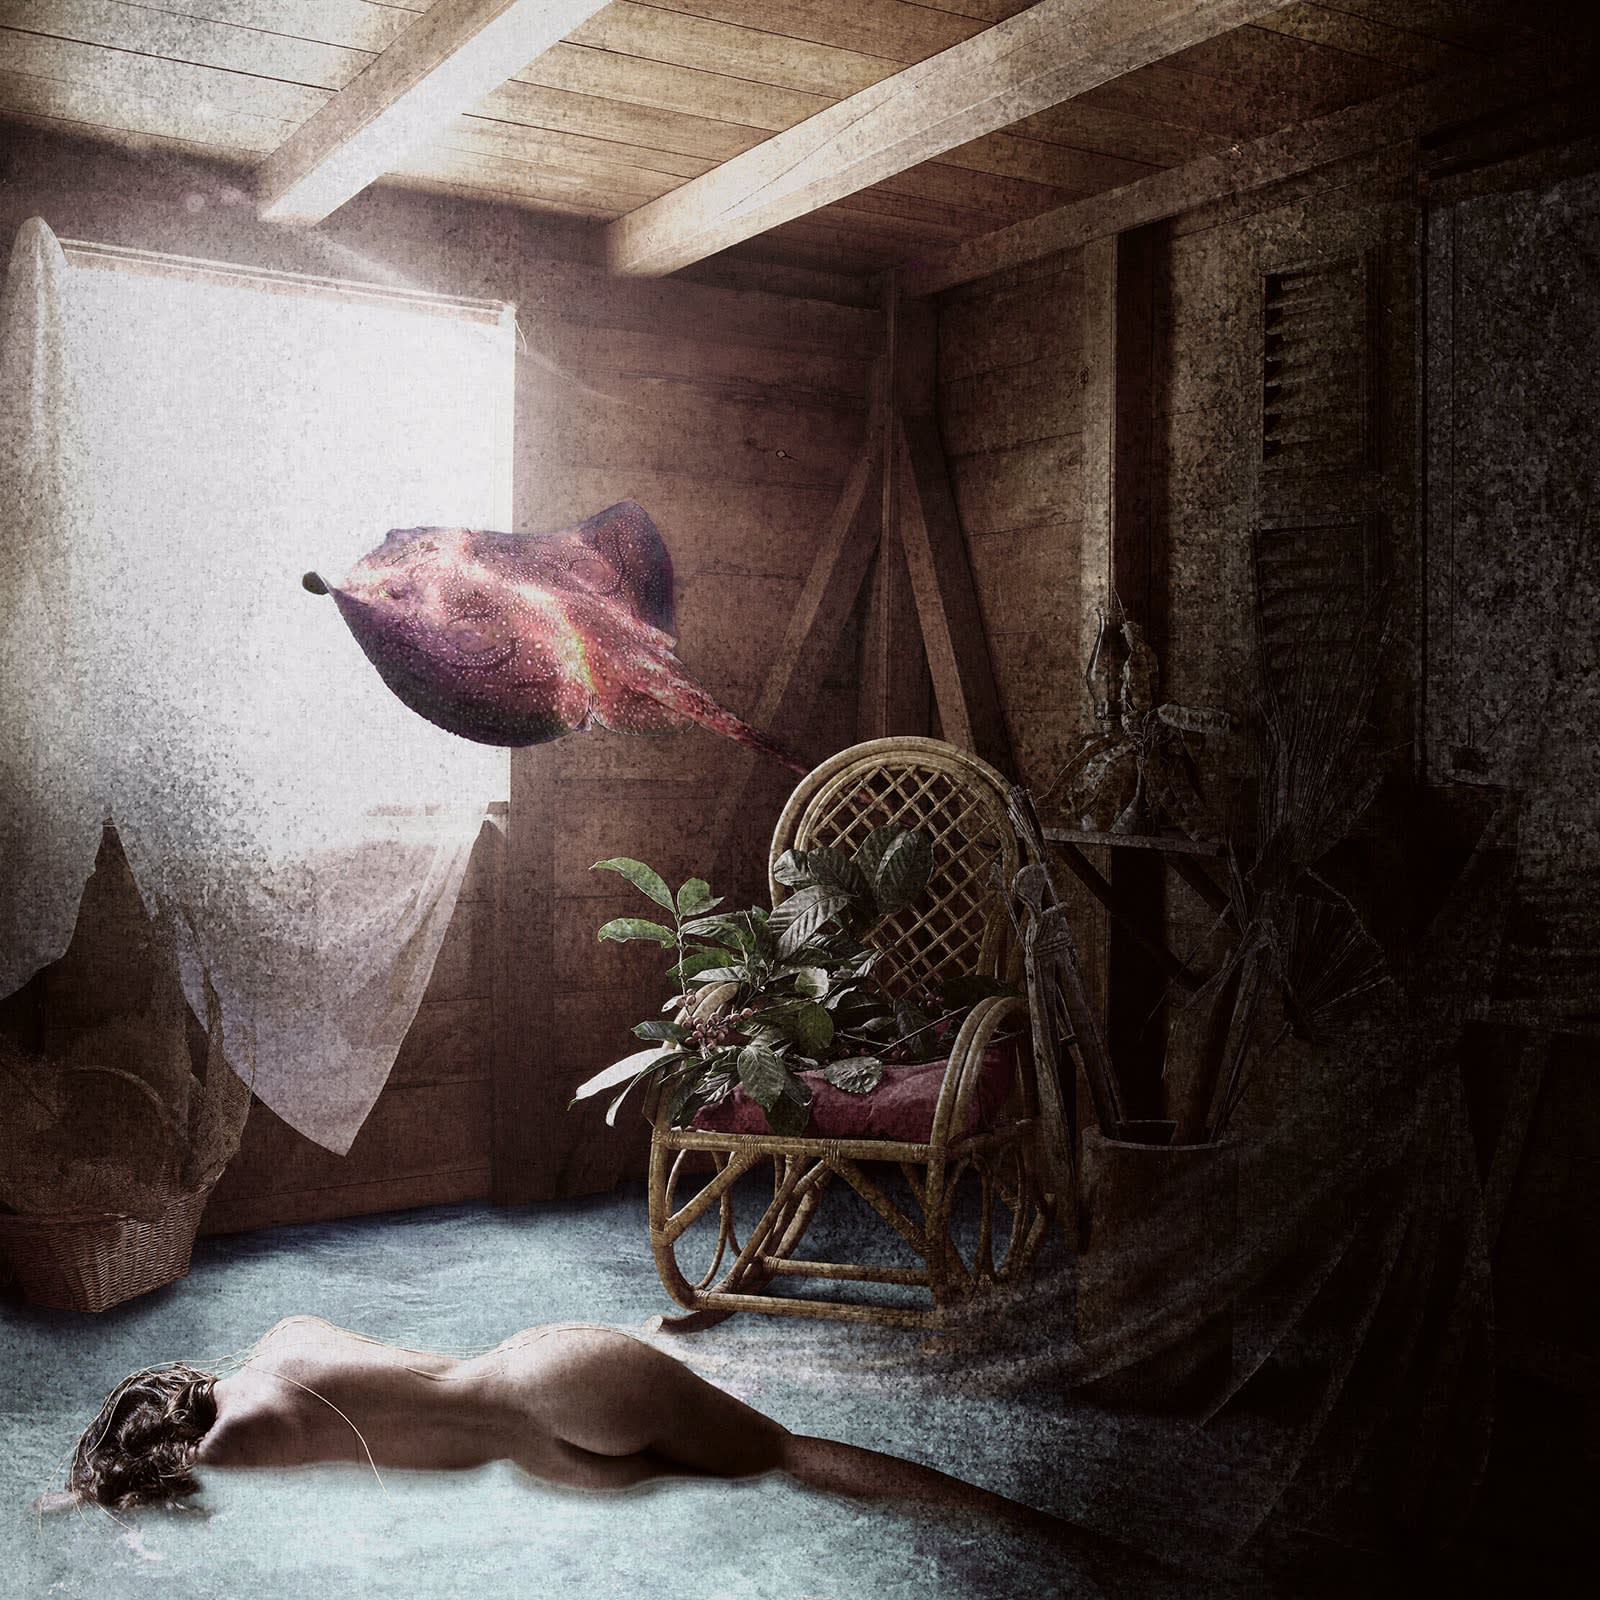 Alain Lacki, Sweet dreams, 2017